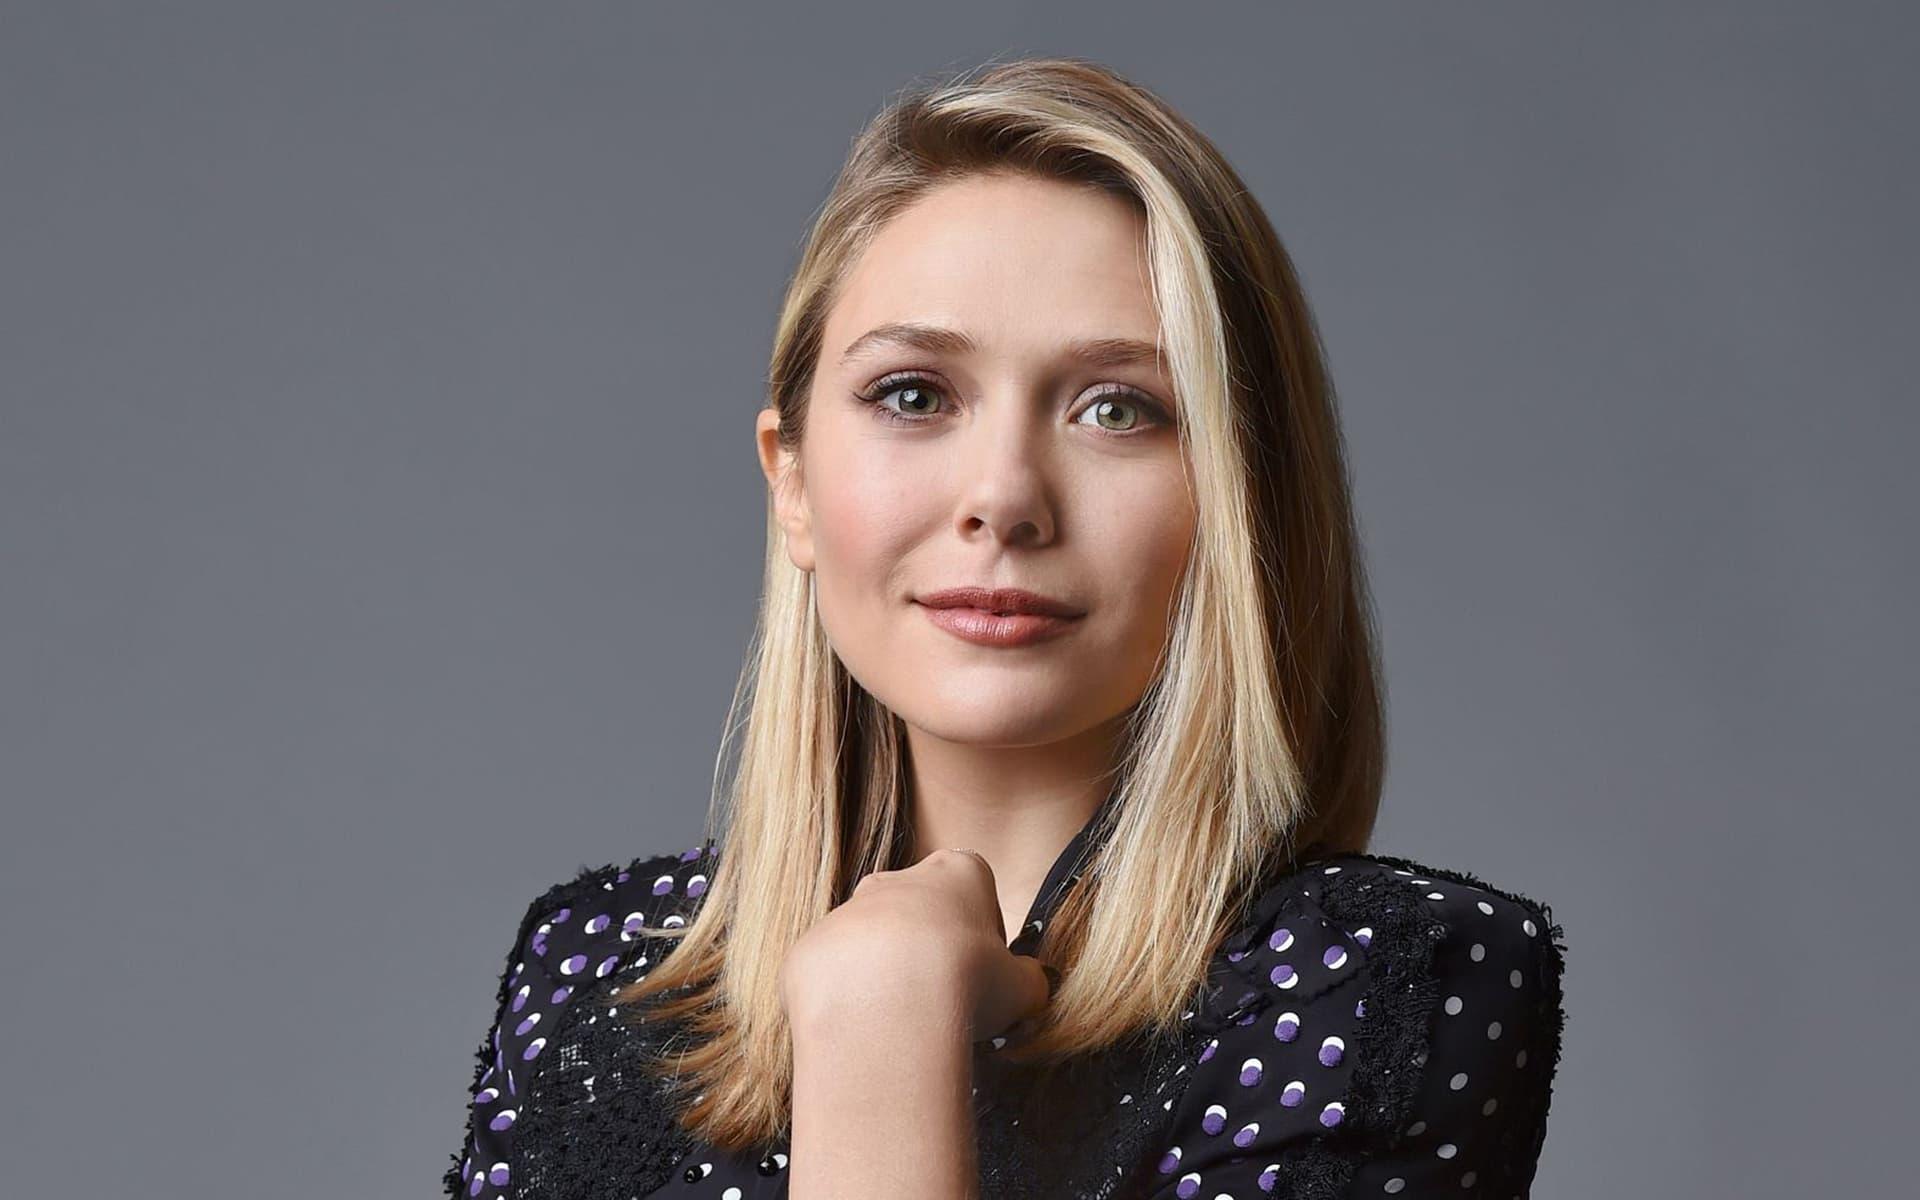 Elizabeth Olsen Makeup HD Wallpaper 66257